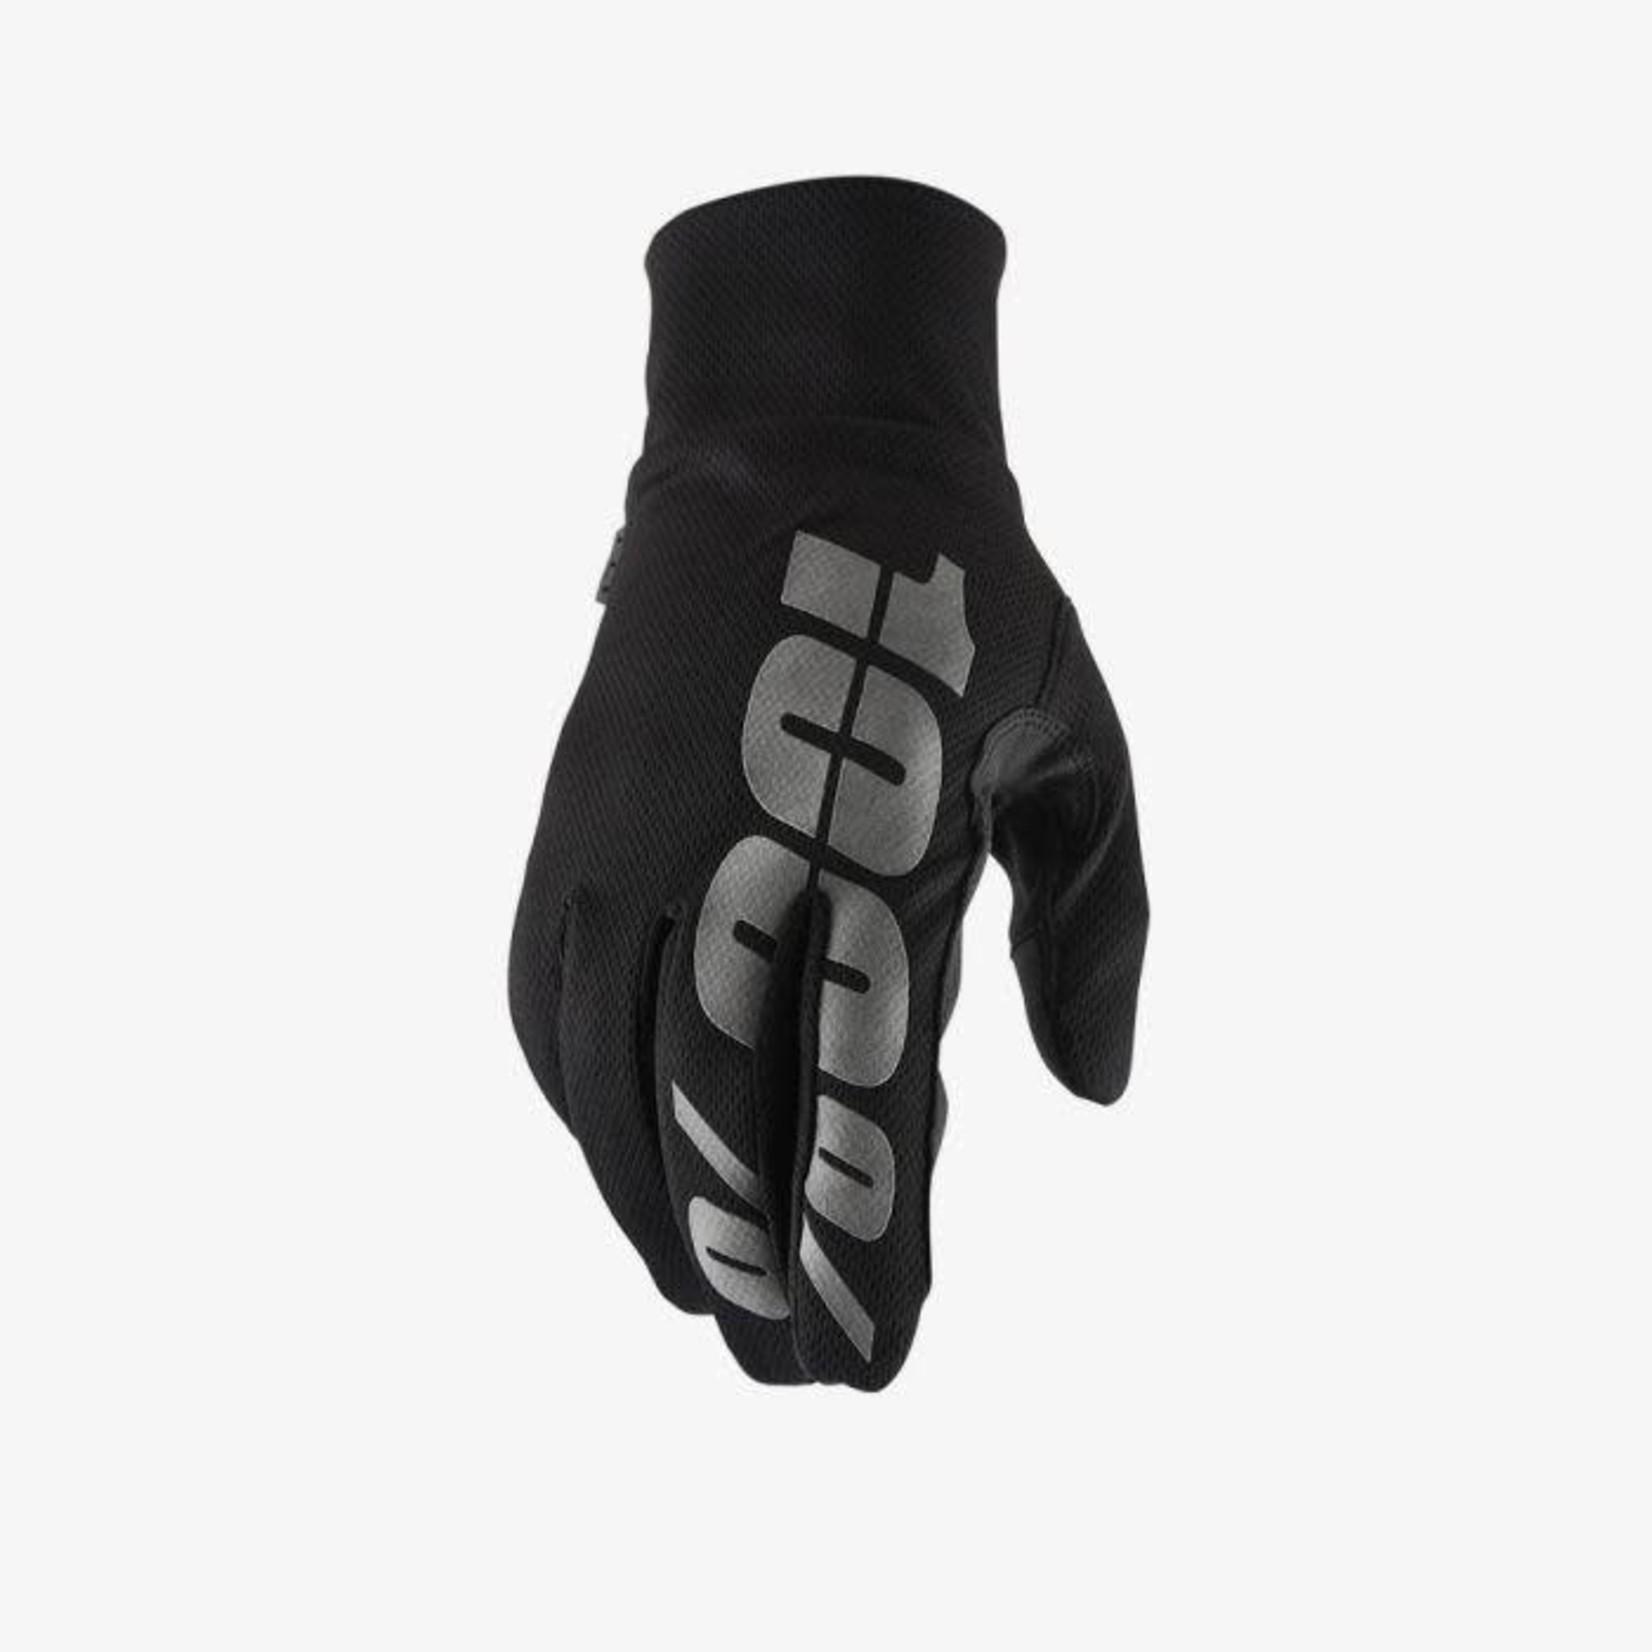 100% 100% Hydromatic Gloves